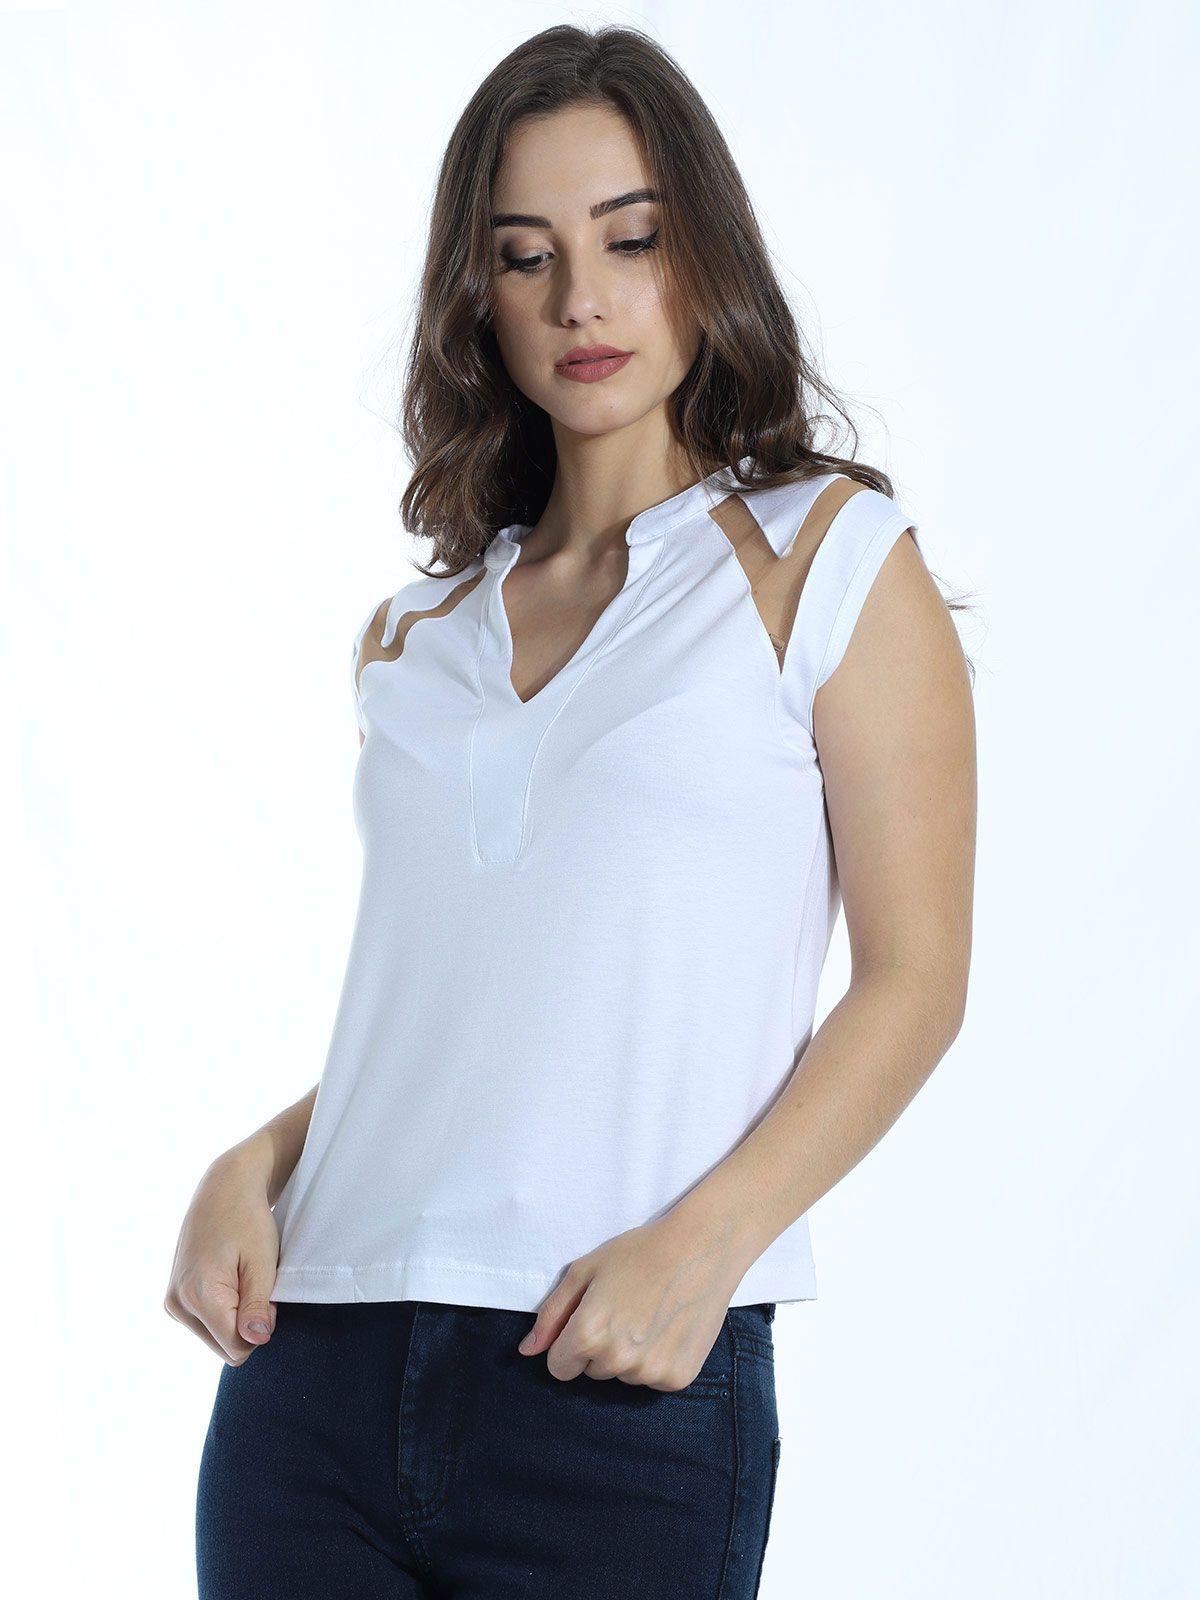 Blusa Anistia Viscolycra Recortes em Tule Branco